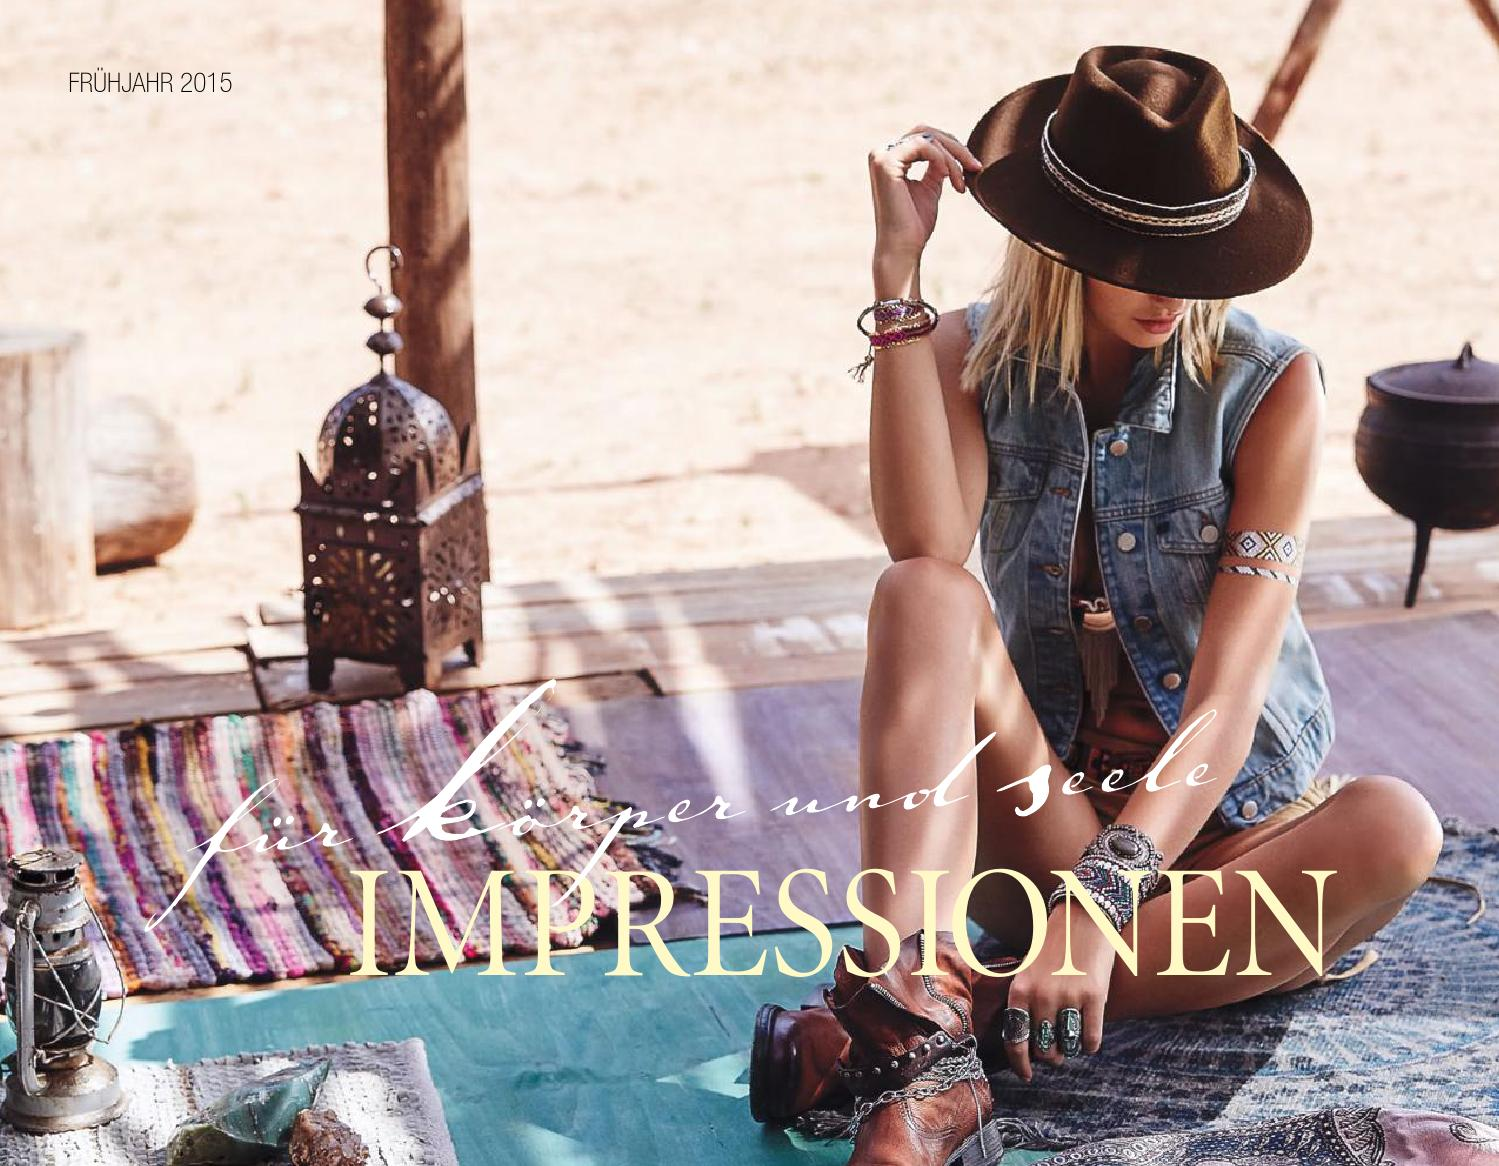 Каталог Impressionen весна 2015. Заказ одежды на www